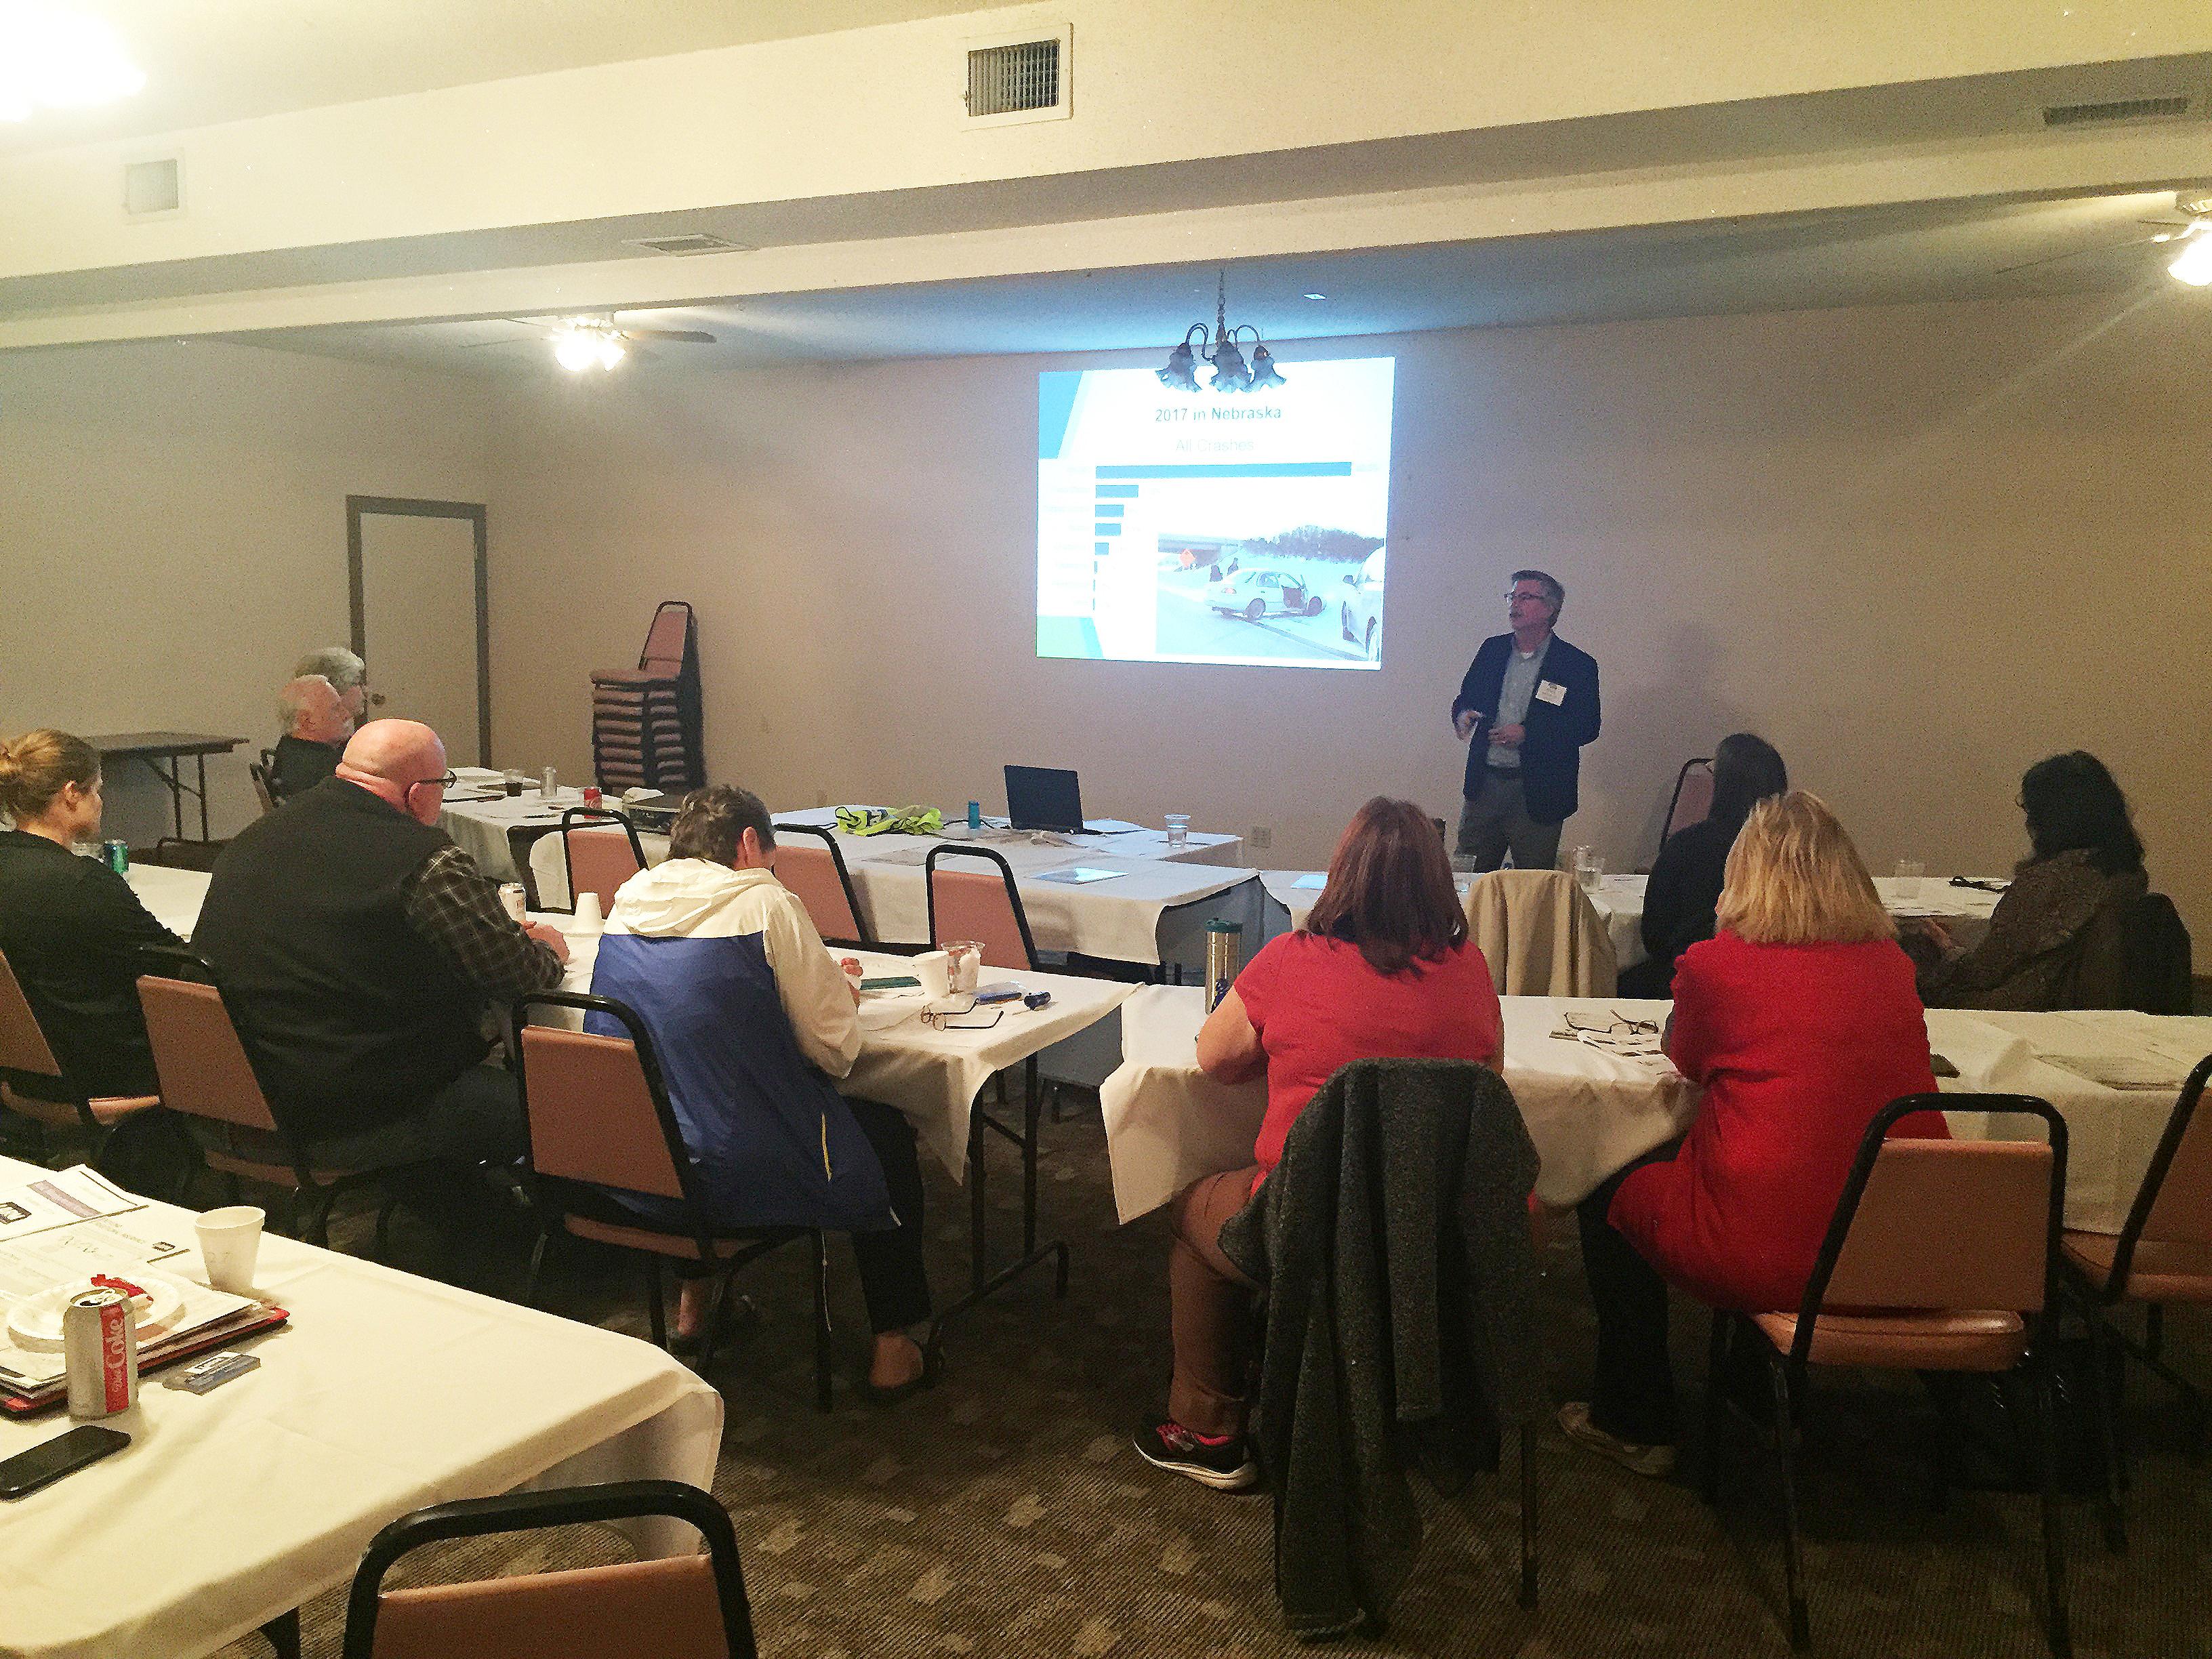 Participants learn at Auburn seminar